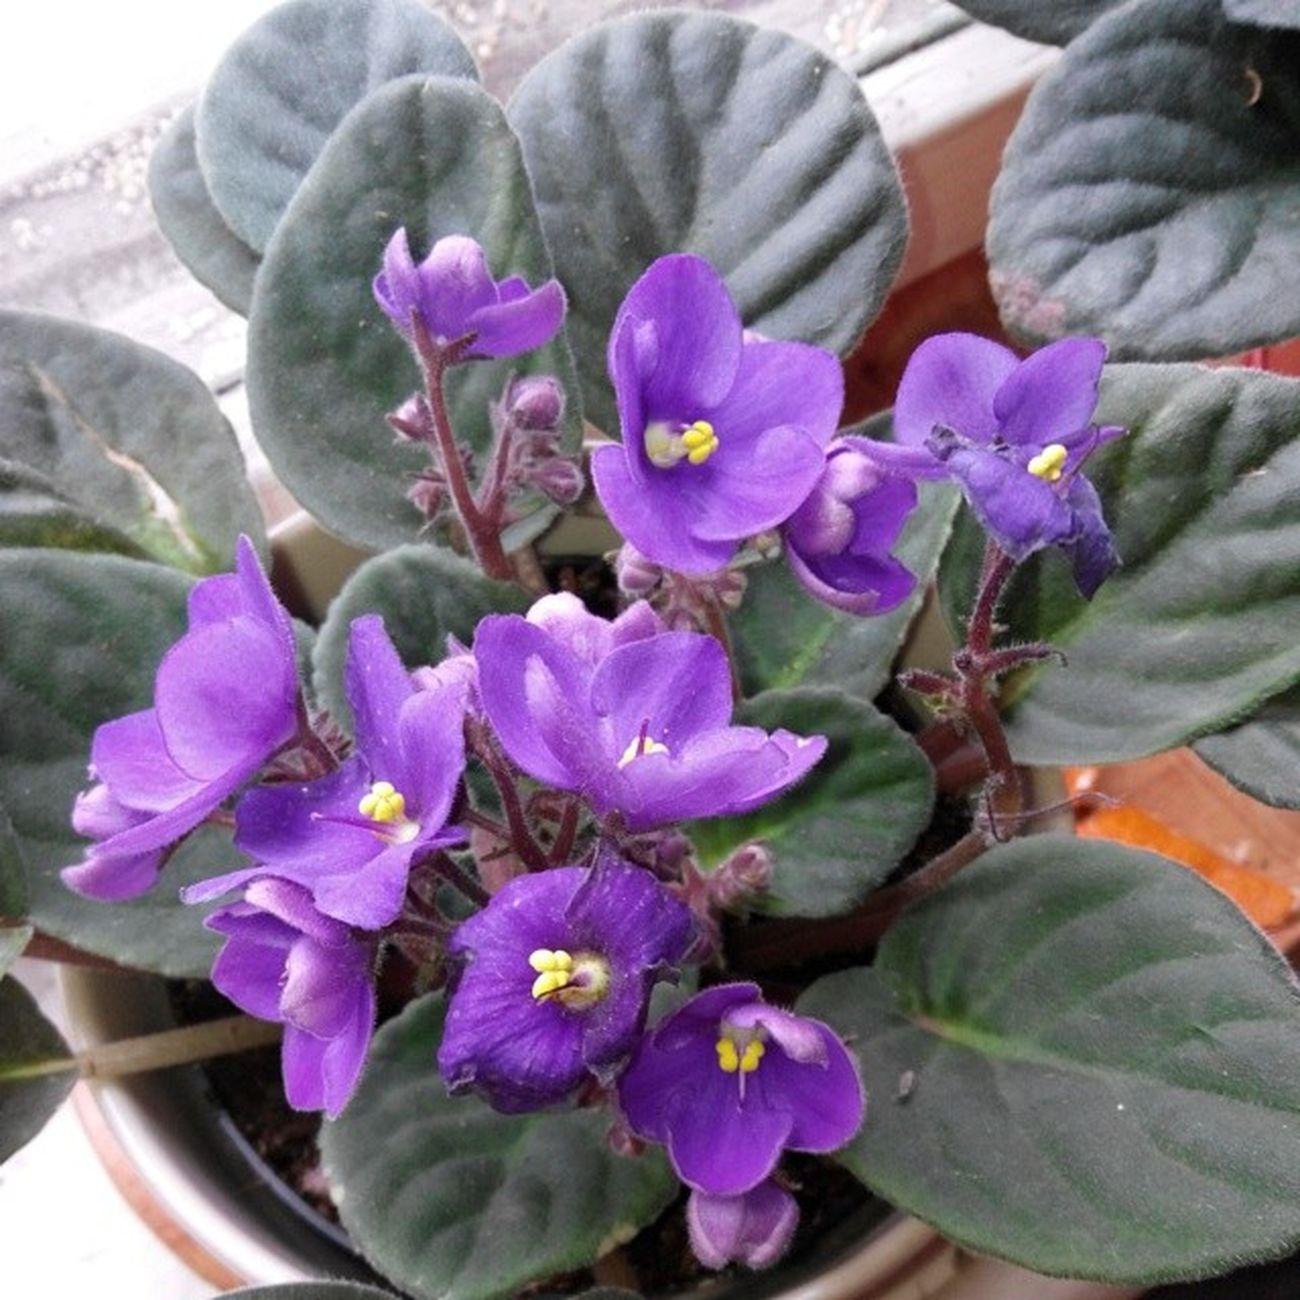 Flowersagram Instagramflowers Flowers Flower Violet Viola Flowersofinstagram 2014 Instaflower Instaflowers цветок  цветы Houseplant Saintpaulia фиалка фиалки